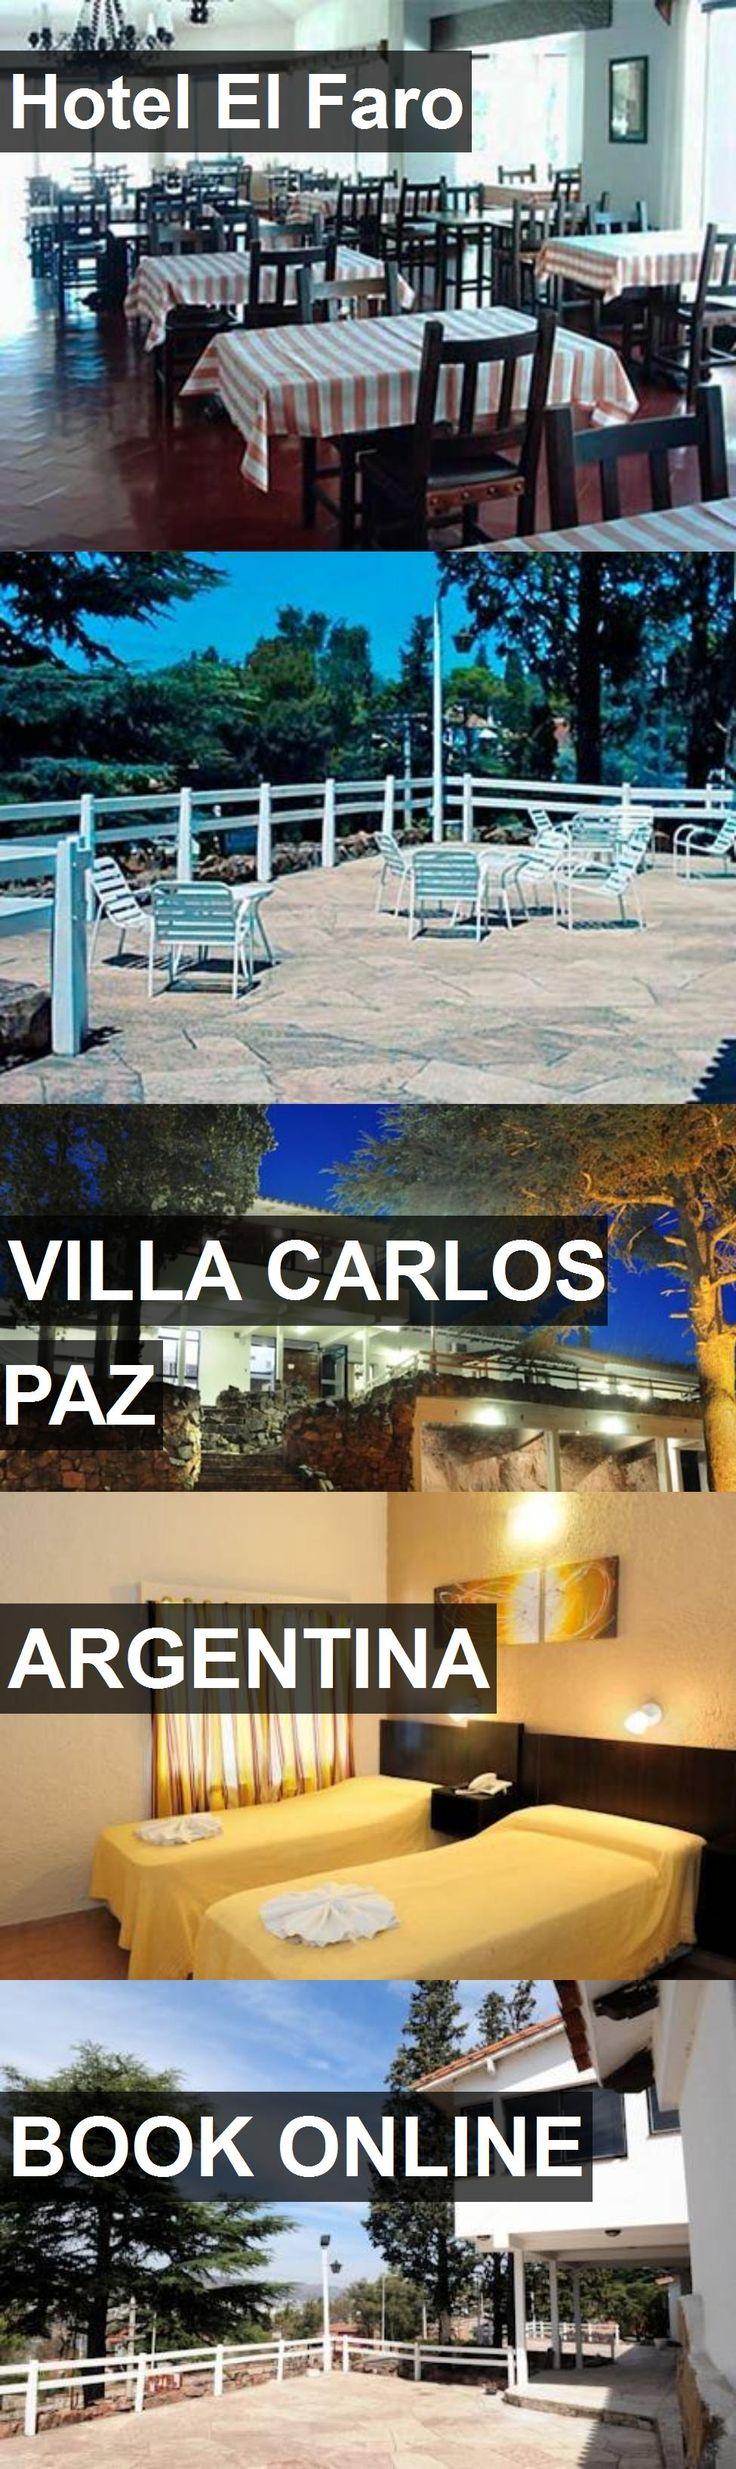 Hotel El Faro in Villa Carlos Paz, Argentina. For more information, photos, reviews and best prices please follow the link. #Argentina #VillaCarlosPaz #travel #vacation #hotel